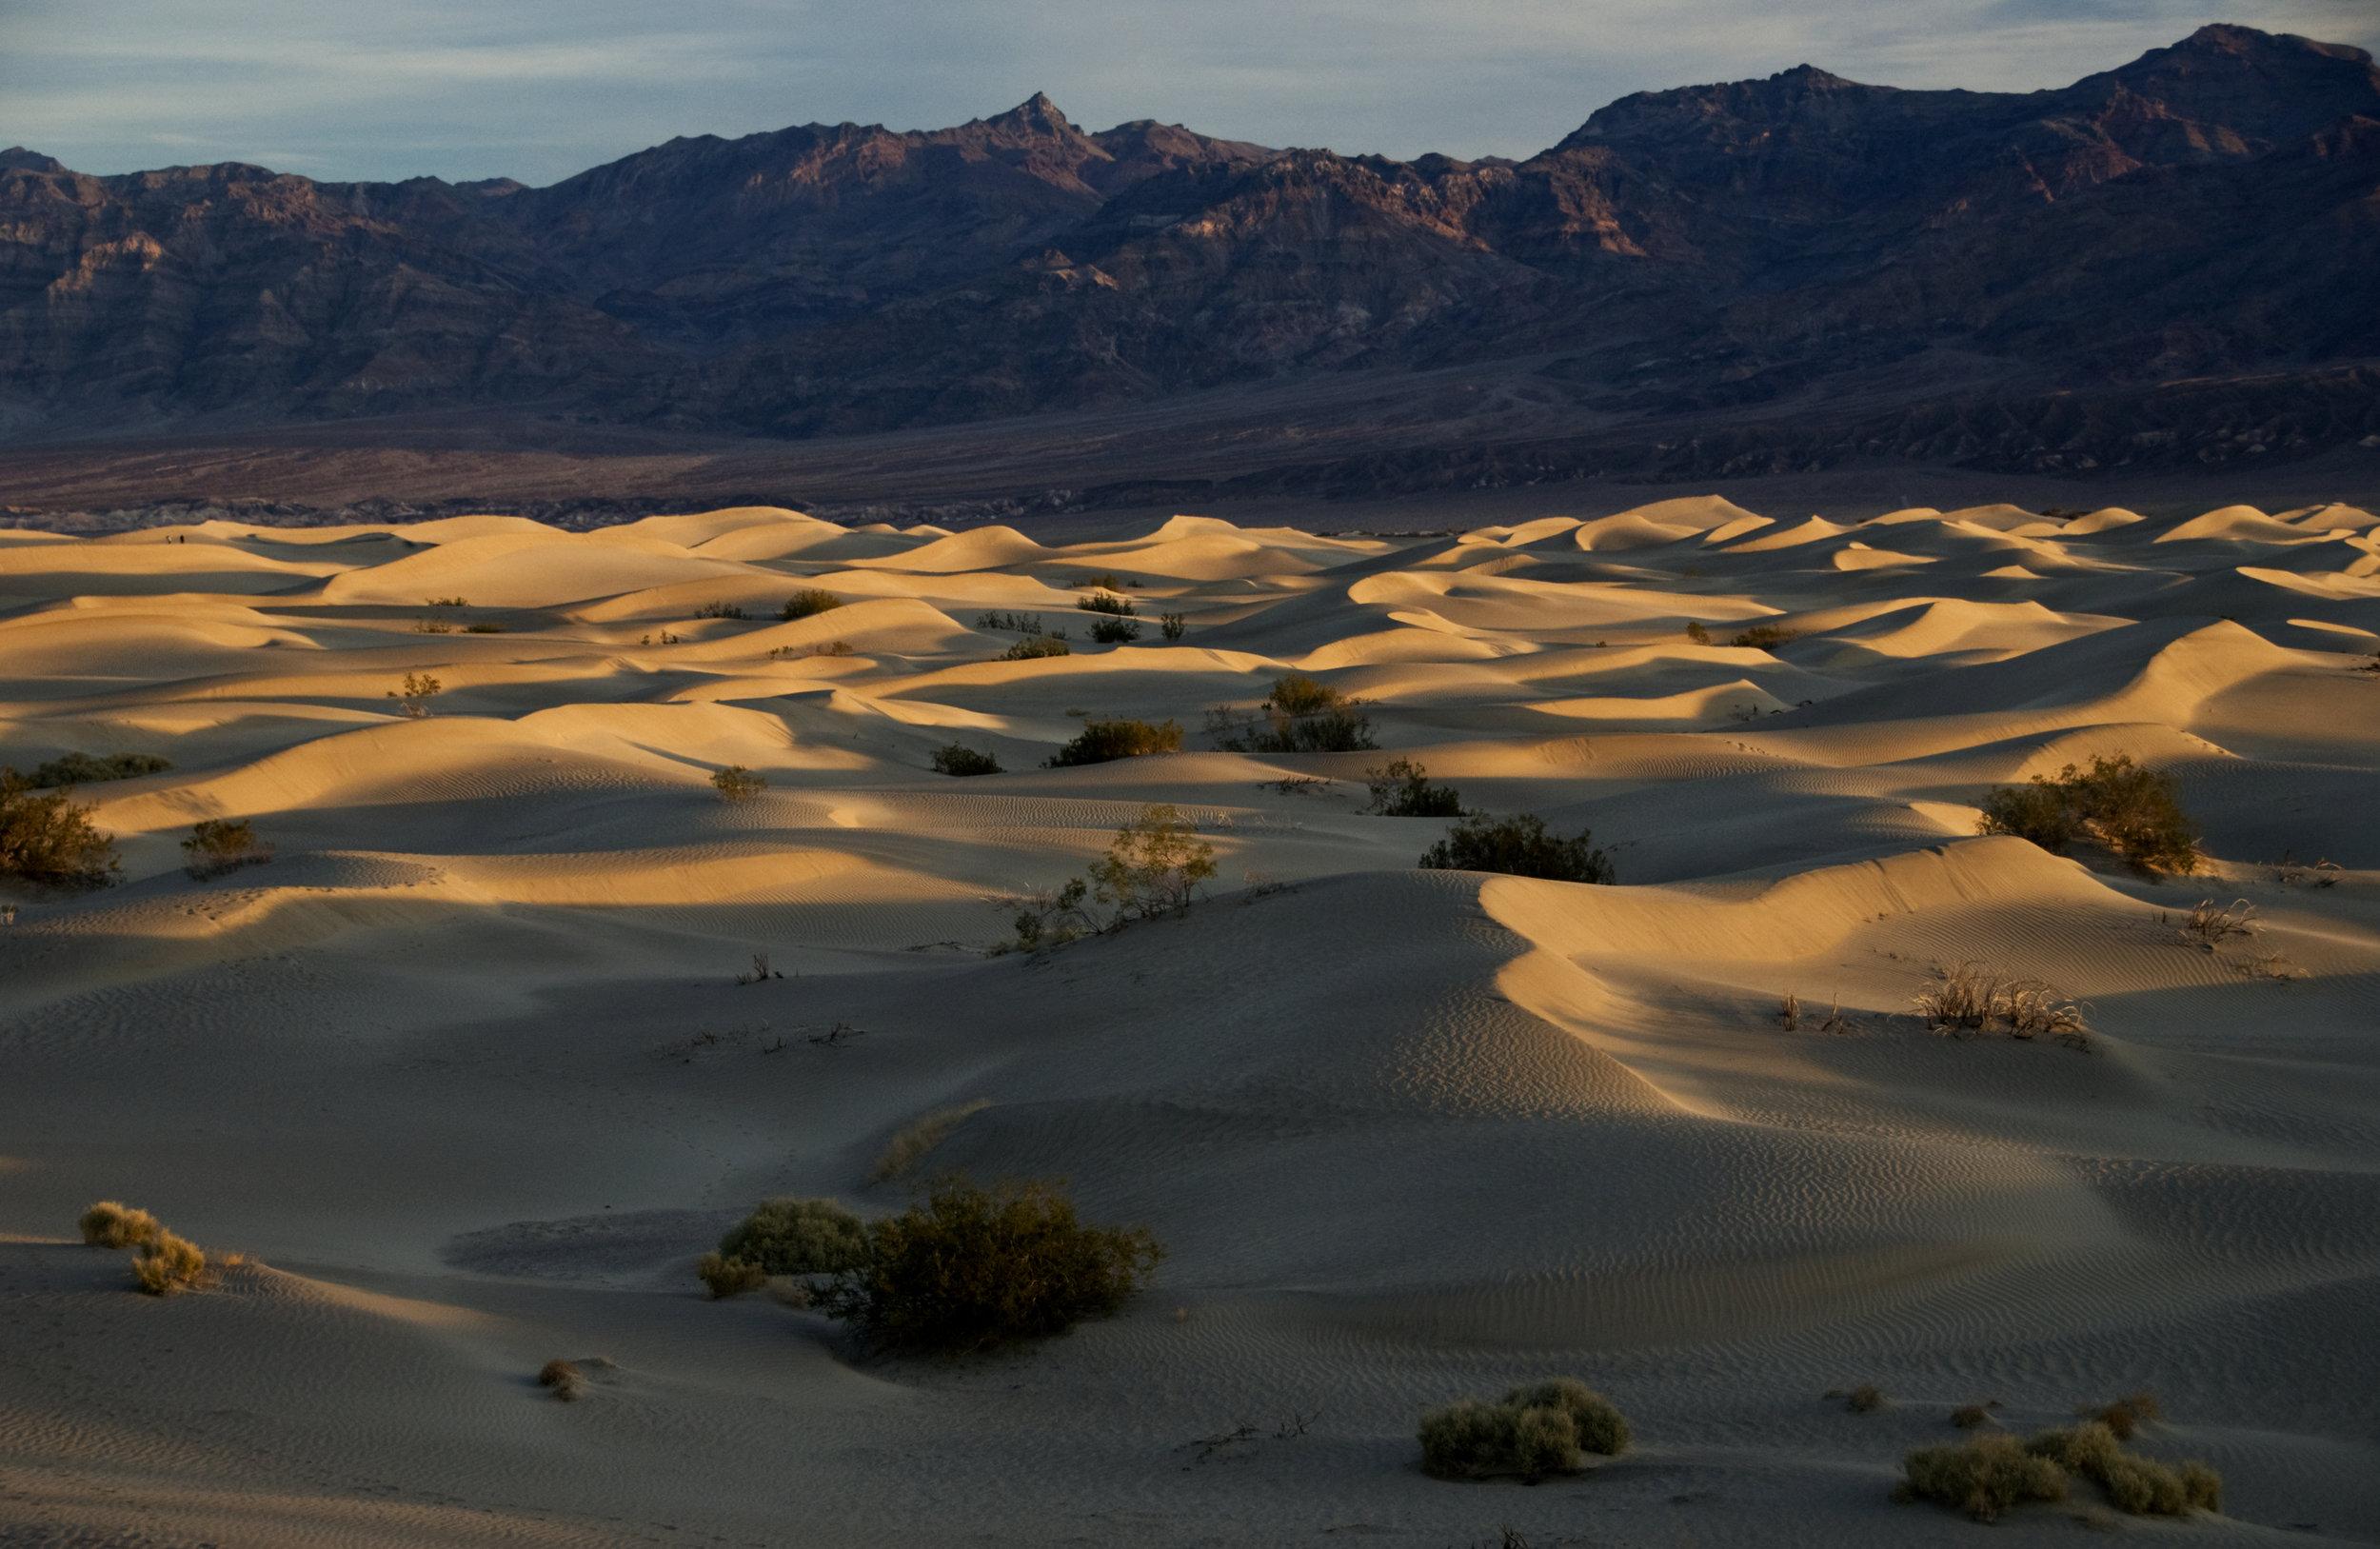 Stovepipe Wells Dunes